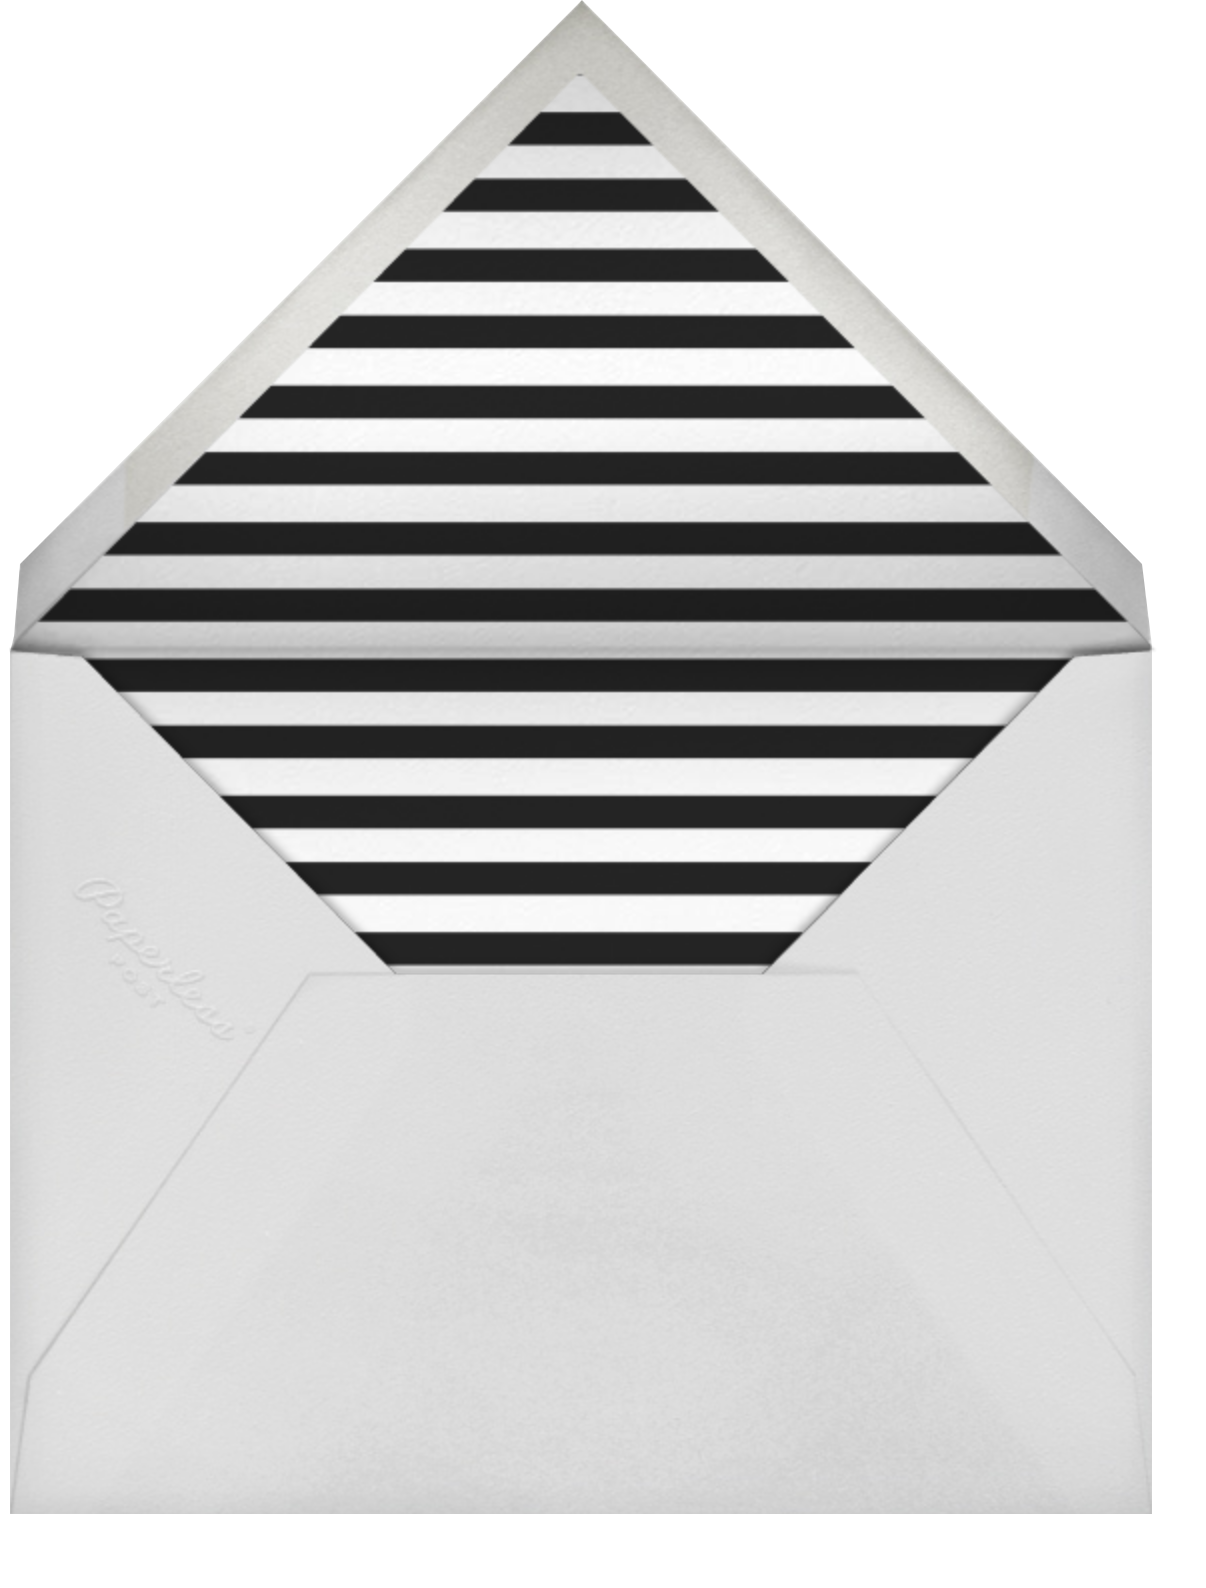 Colbrand - Paperless Post - Photo  - envelope back